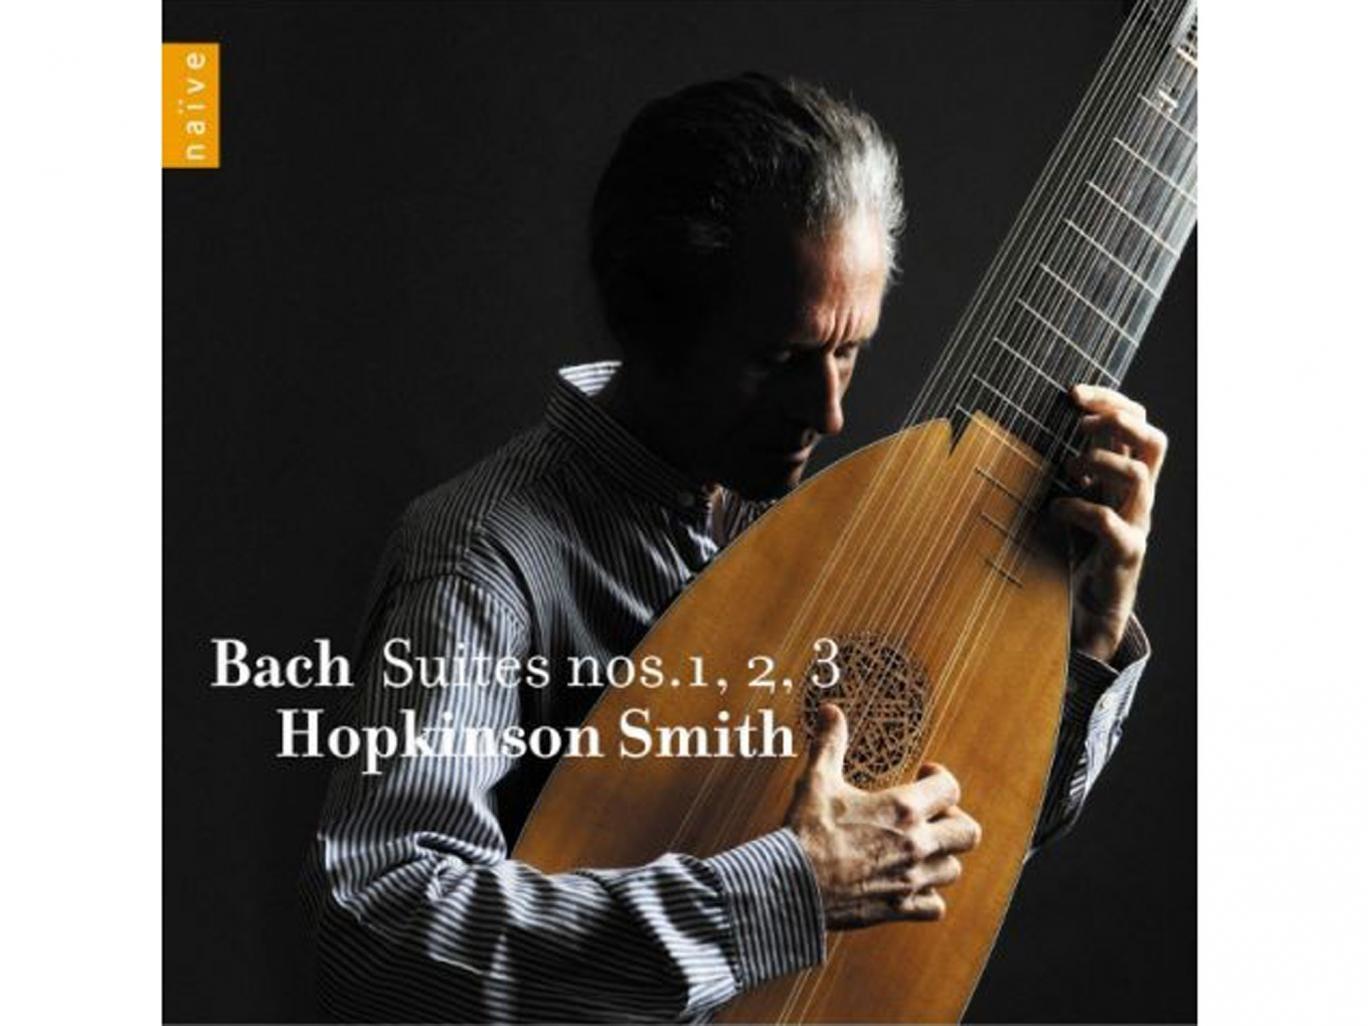 Hopkinson Smith, Bach: Suites Nos. 1, 2, 3 (Naïve)